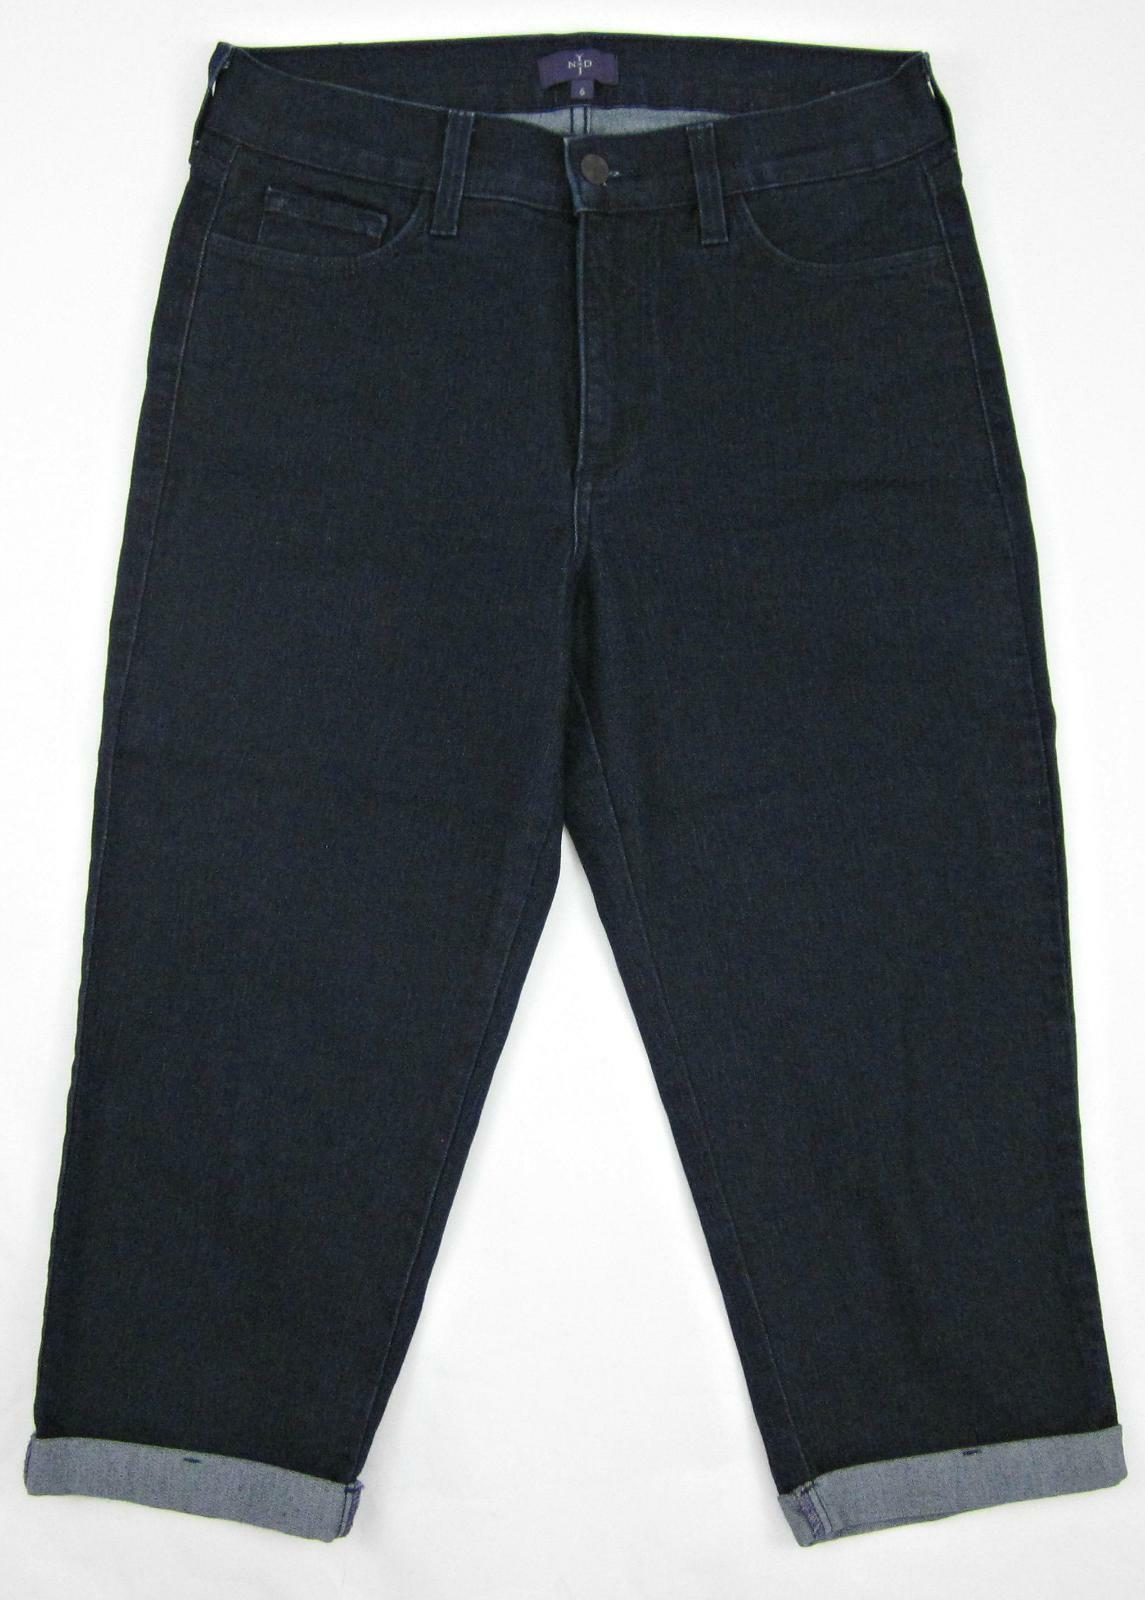 NYDJ Not Your Daughter's Jeans Crop Capri Cuffed Sz 6 Dark Denim  MINT